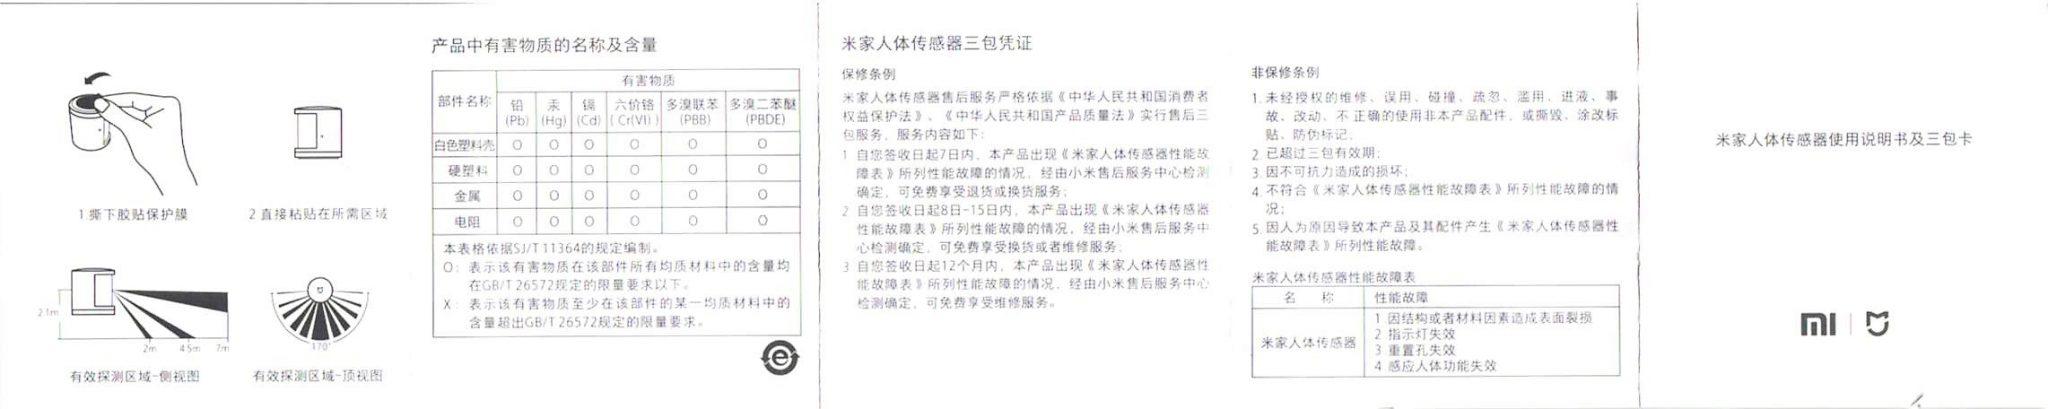 Xiaomi mijia スマートホームセキュリティキット 取説 人感センサー2